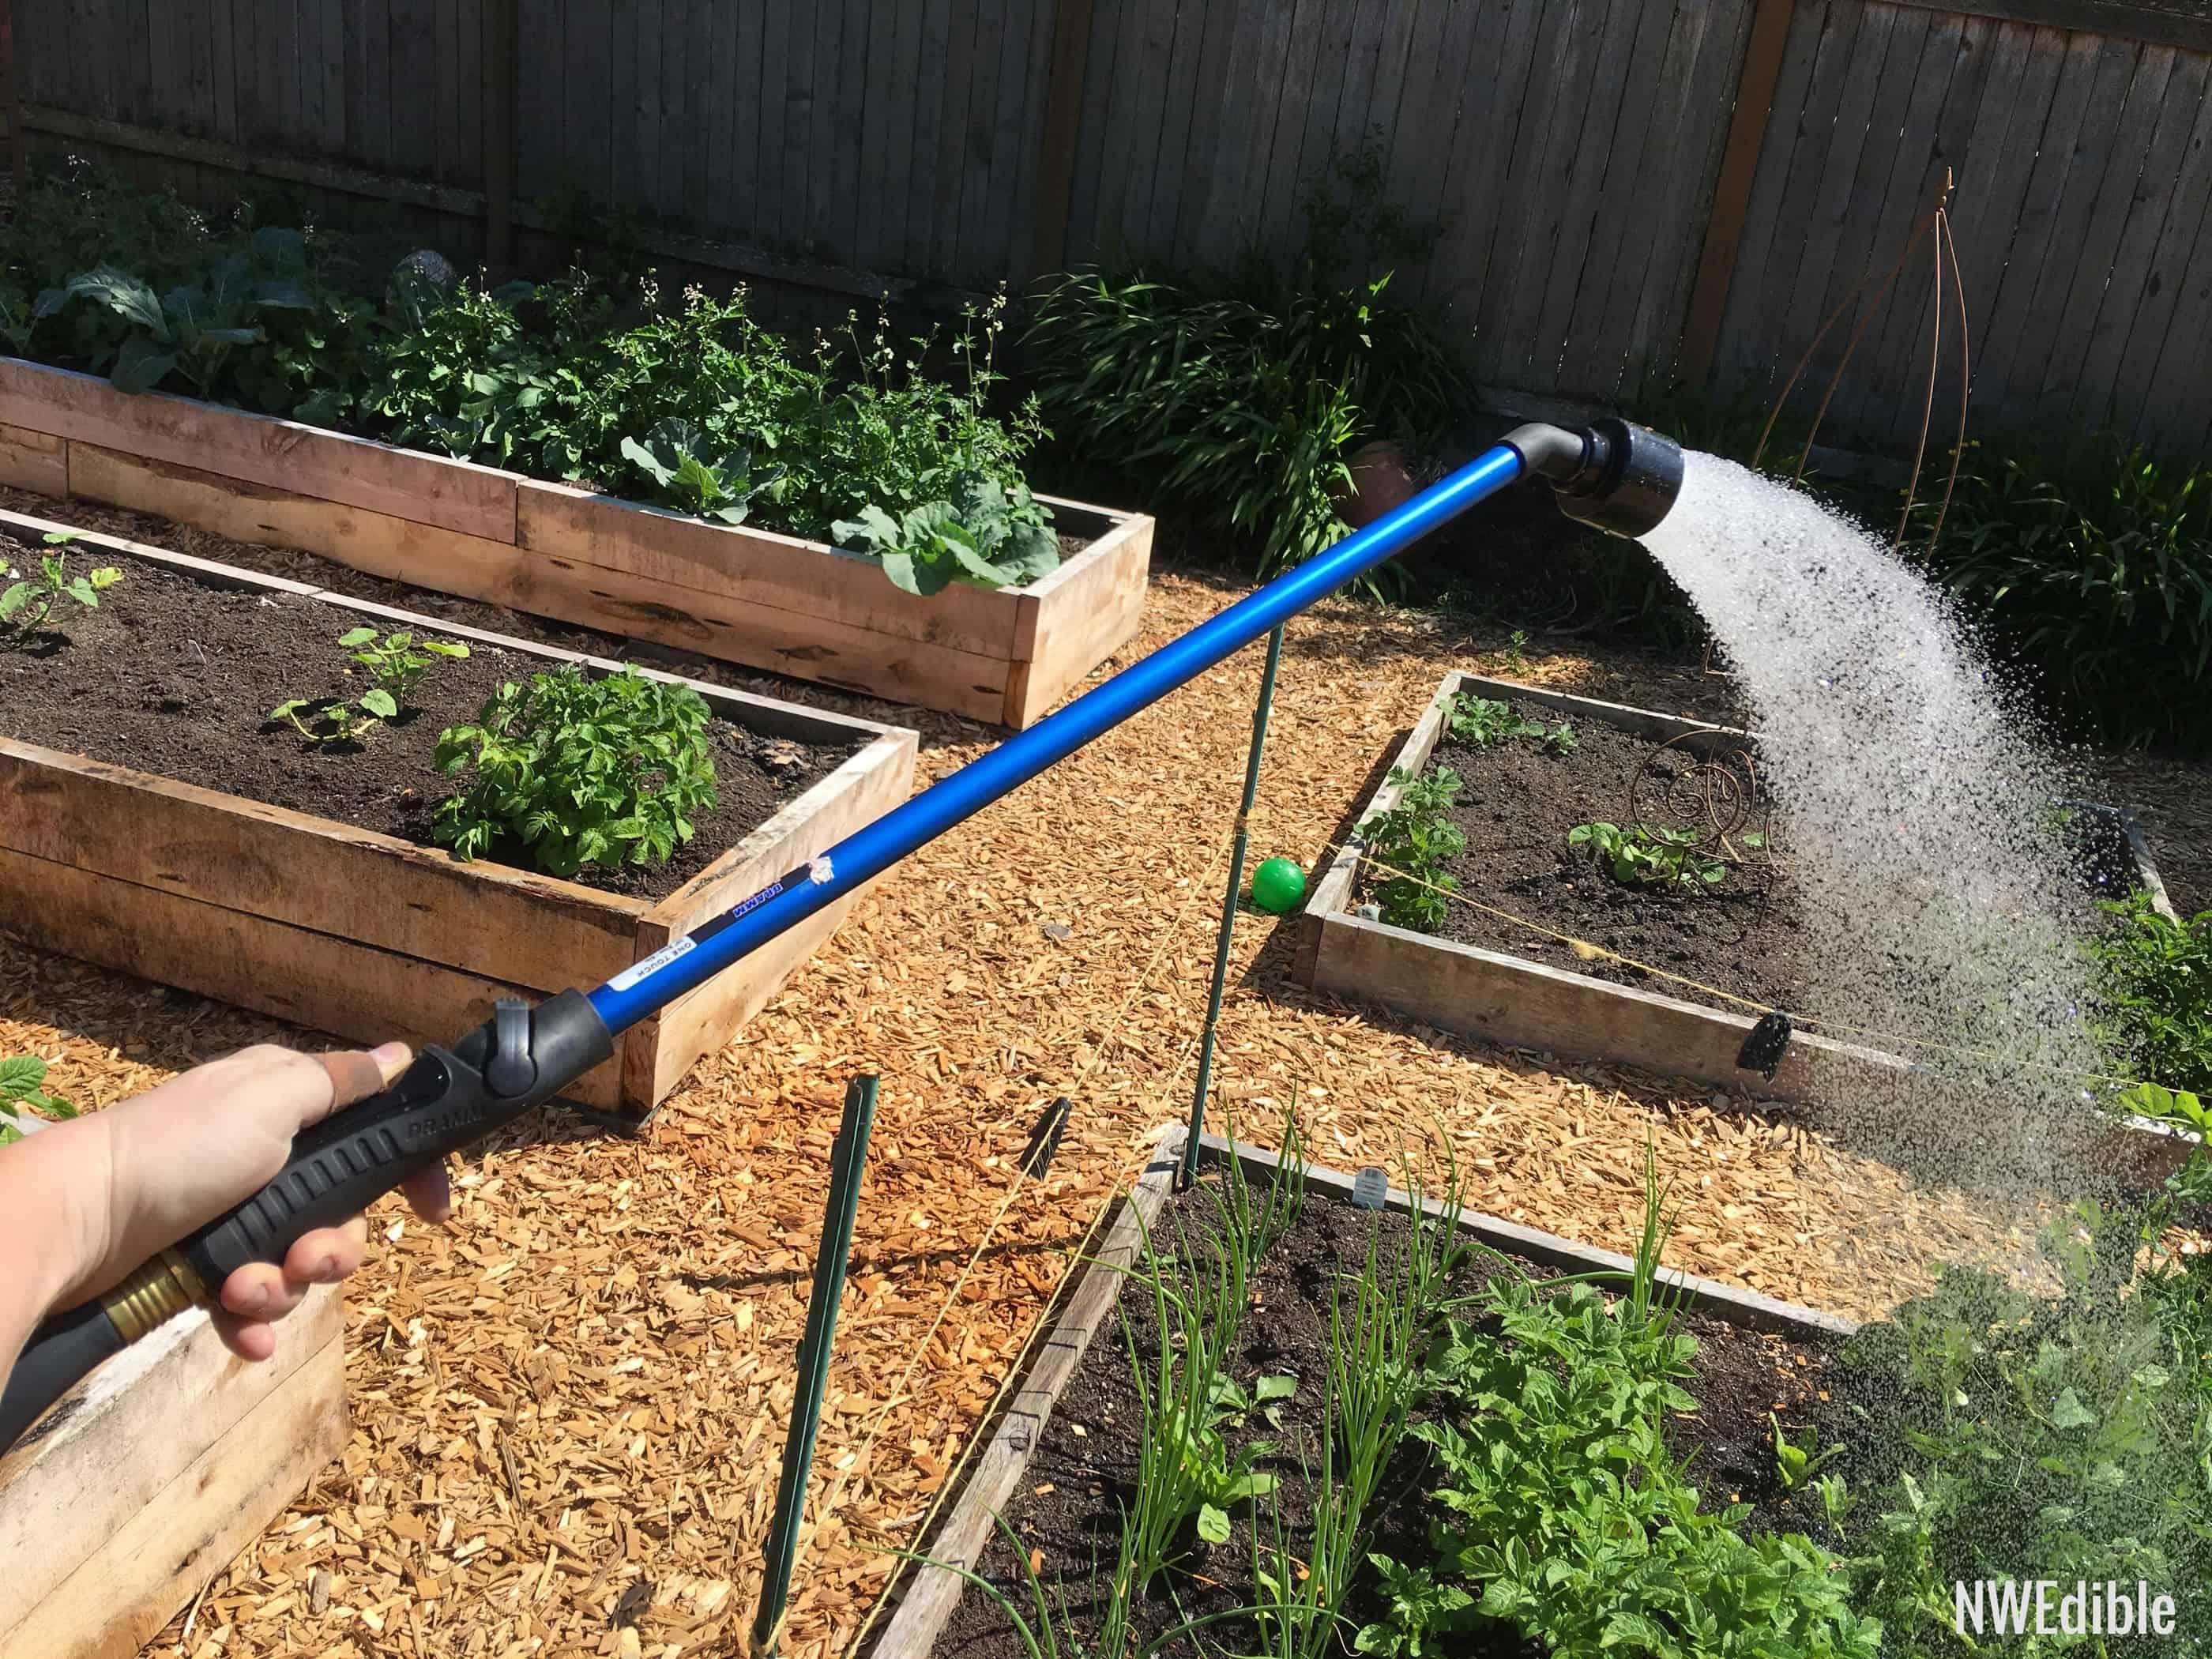 Dramm watering wand